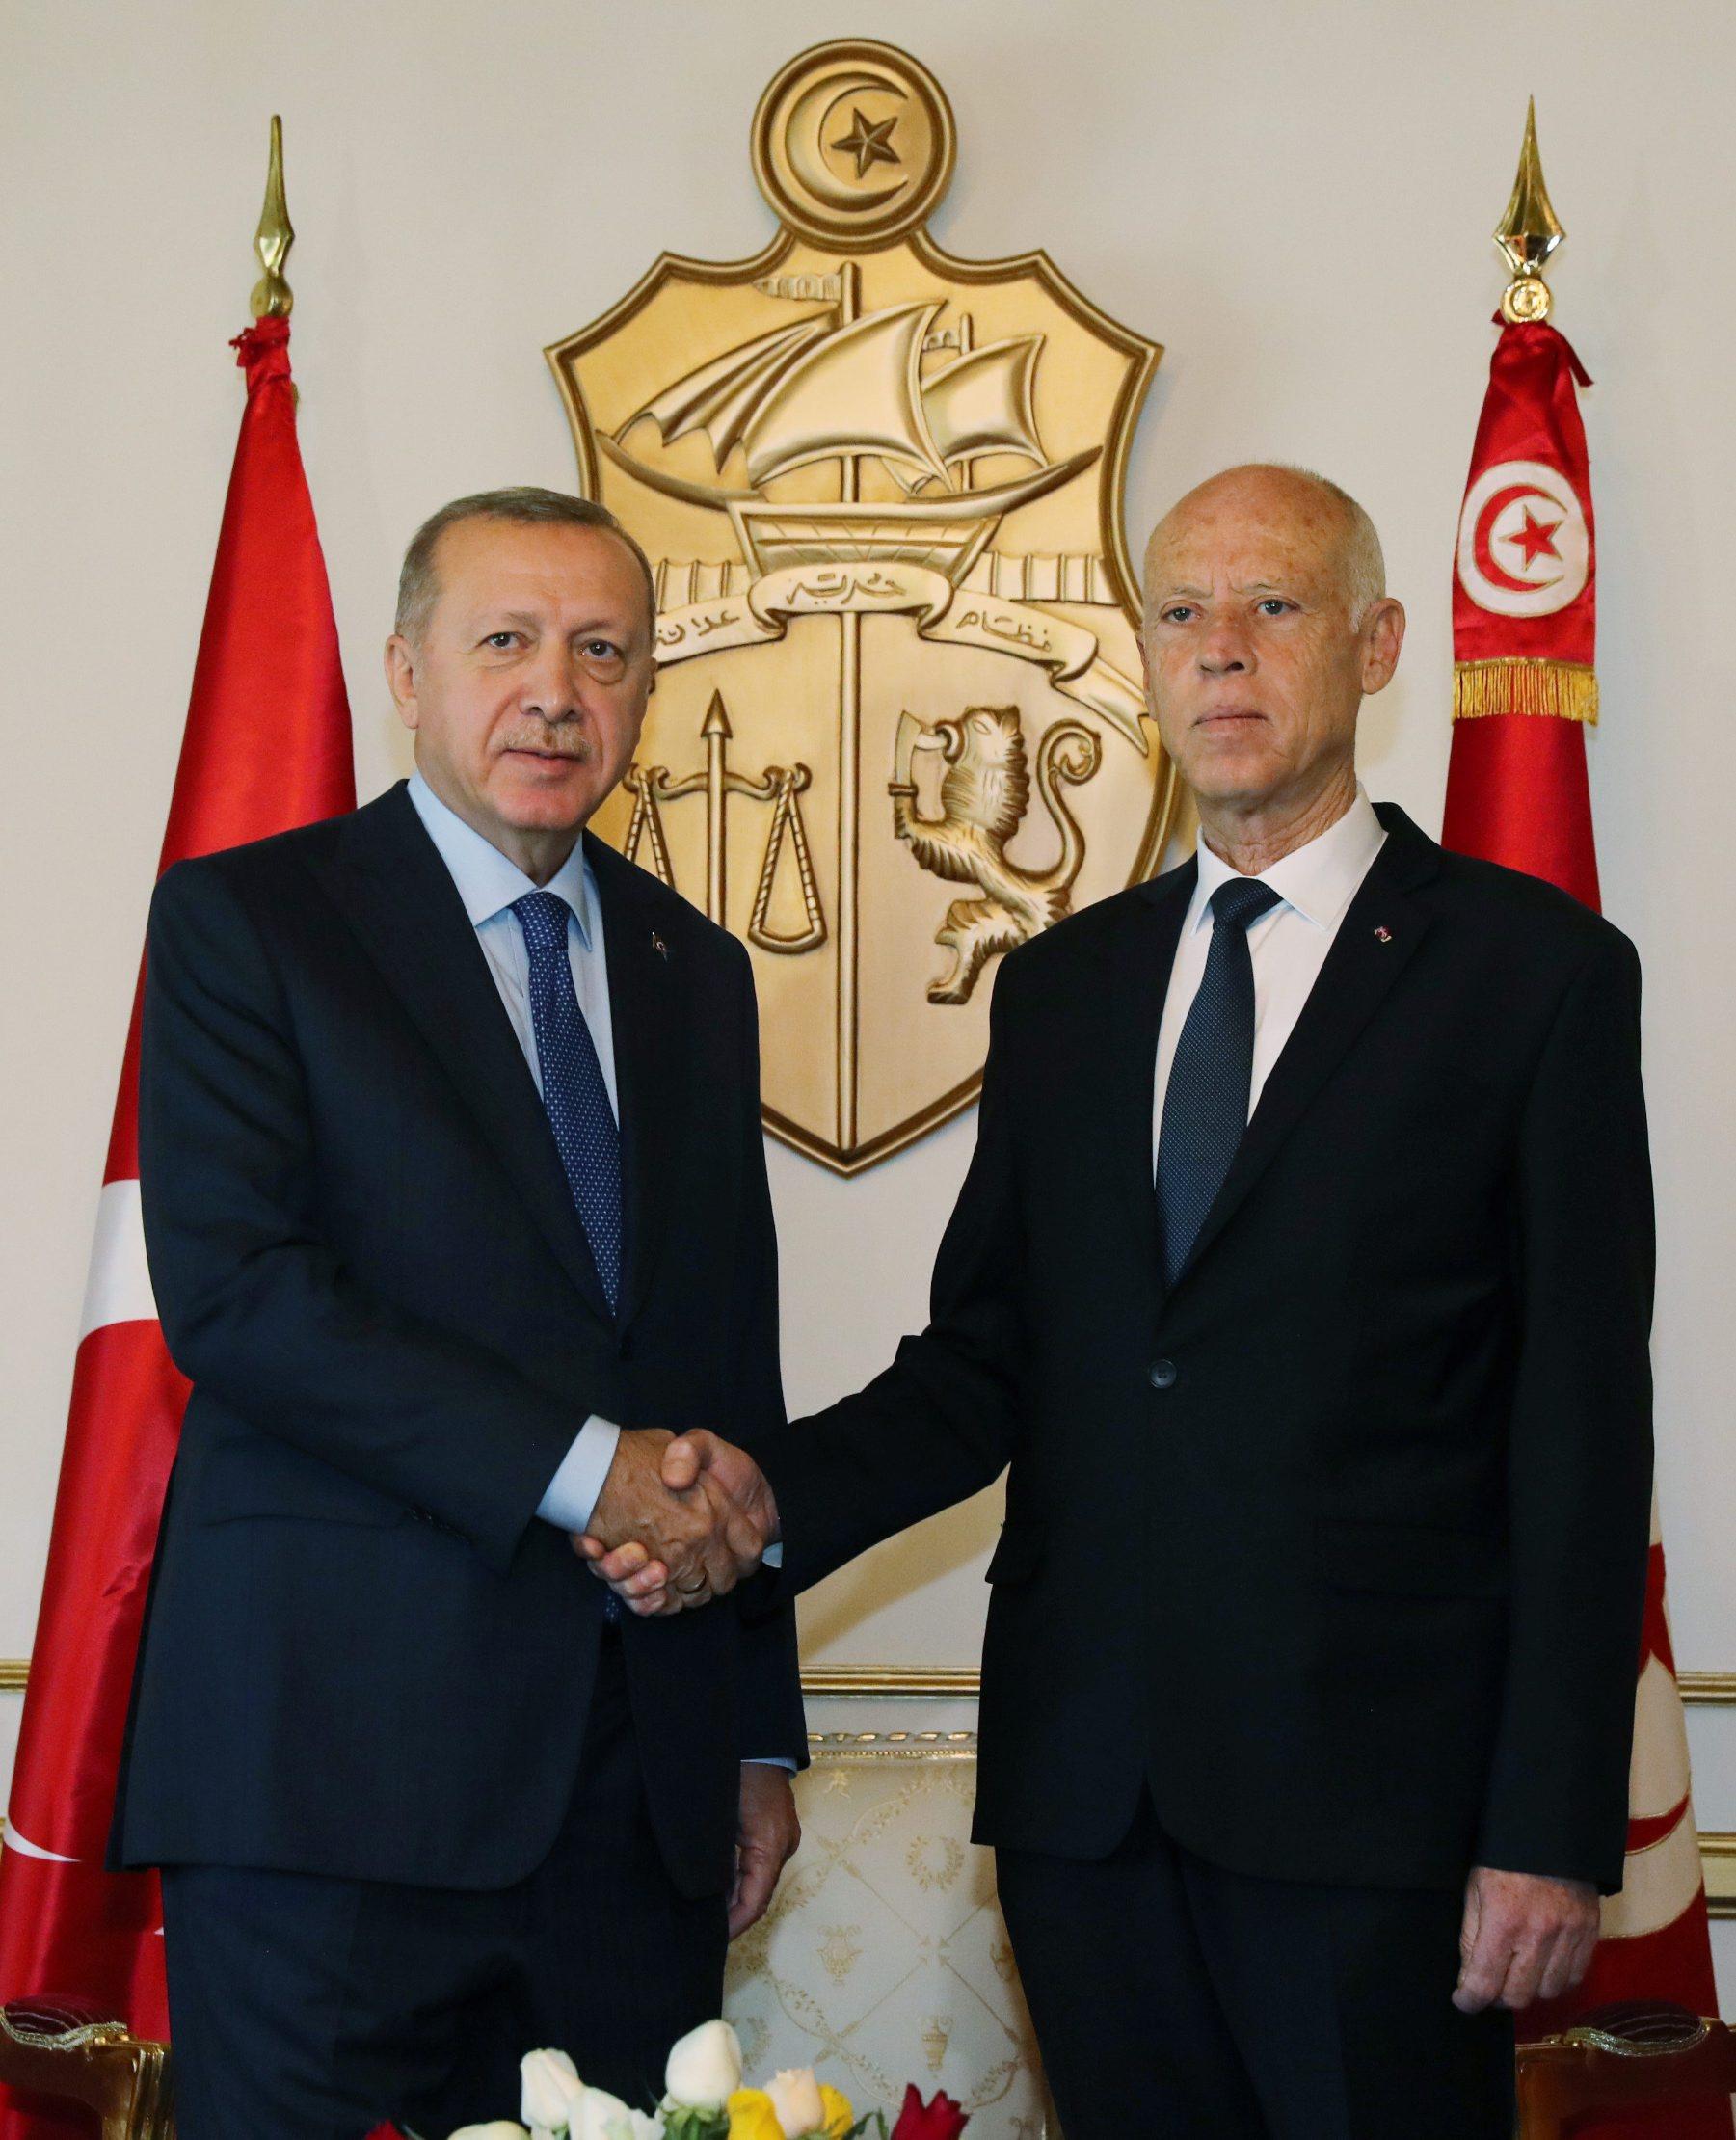 2019-12-25T115853Z_957120901_RC2B2E9VK4MO_RTRMADP_3_TURKEY-TUNISIA-ERDOGAN